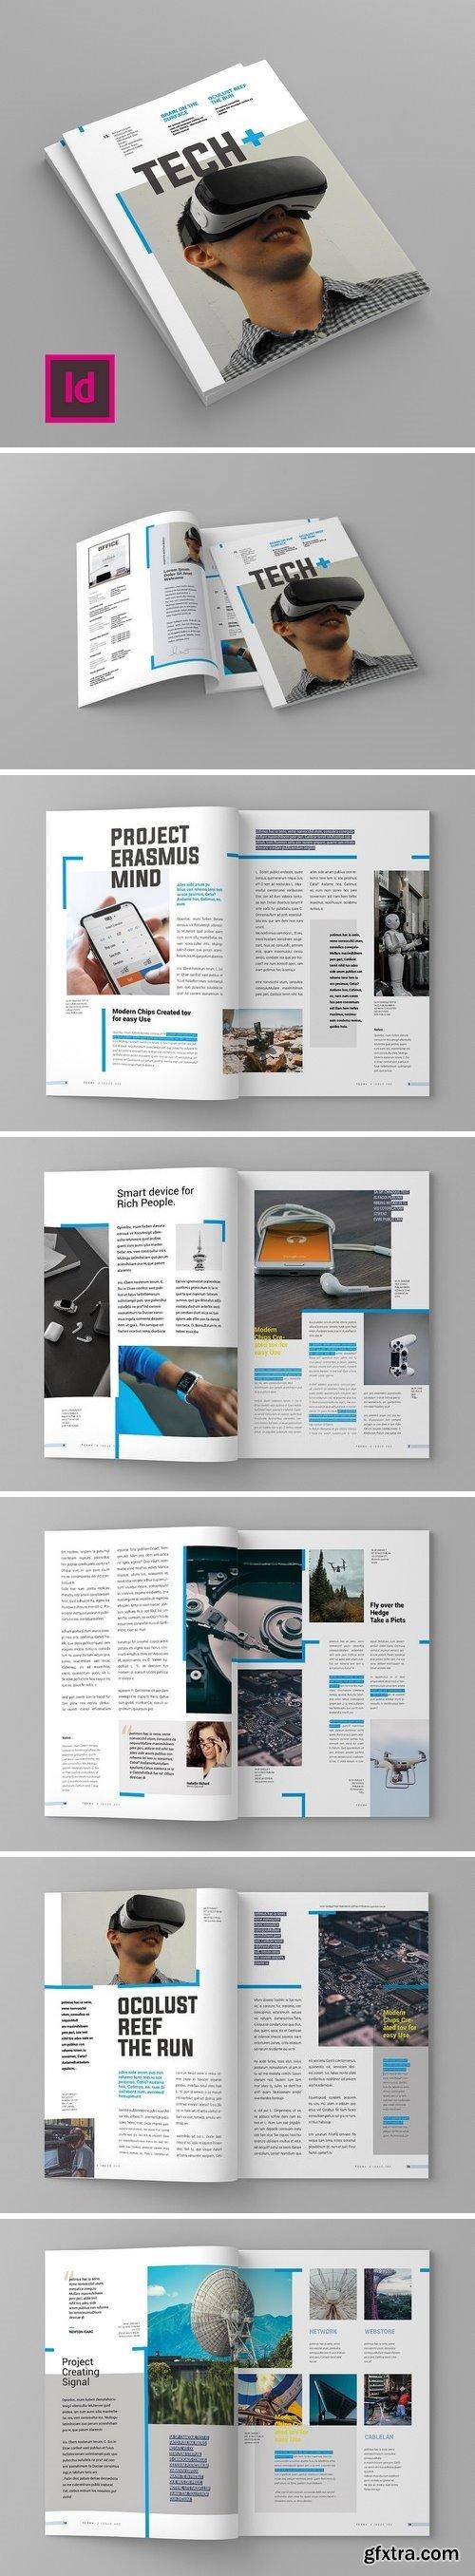 CM - Magazine Template Vol. 15 3278027